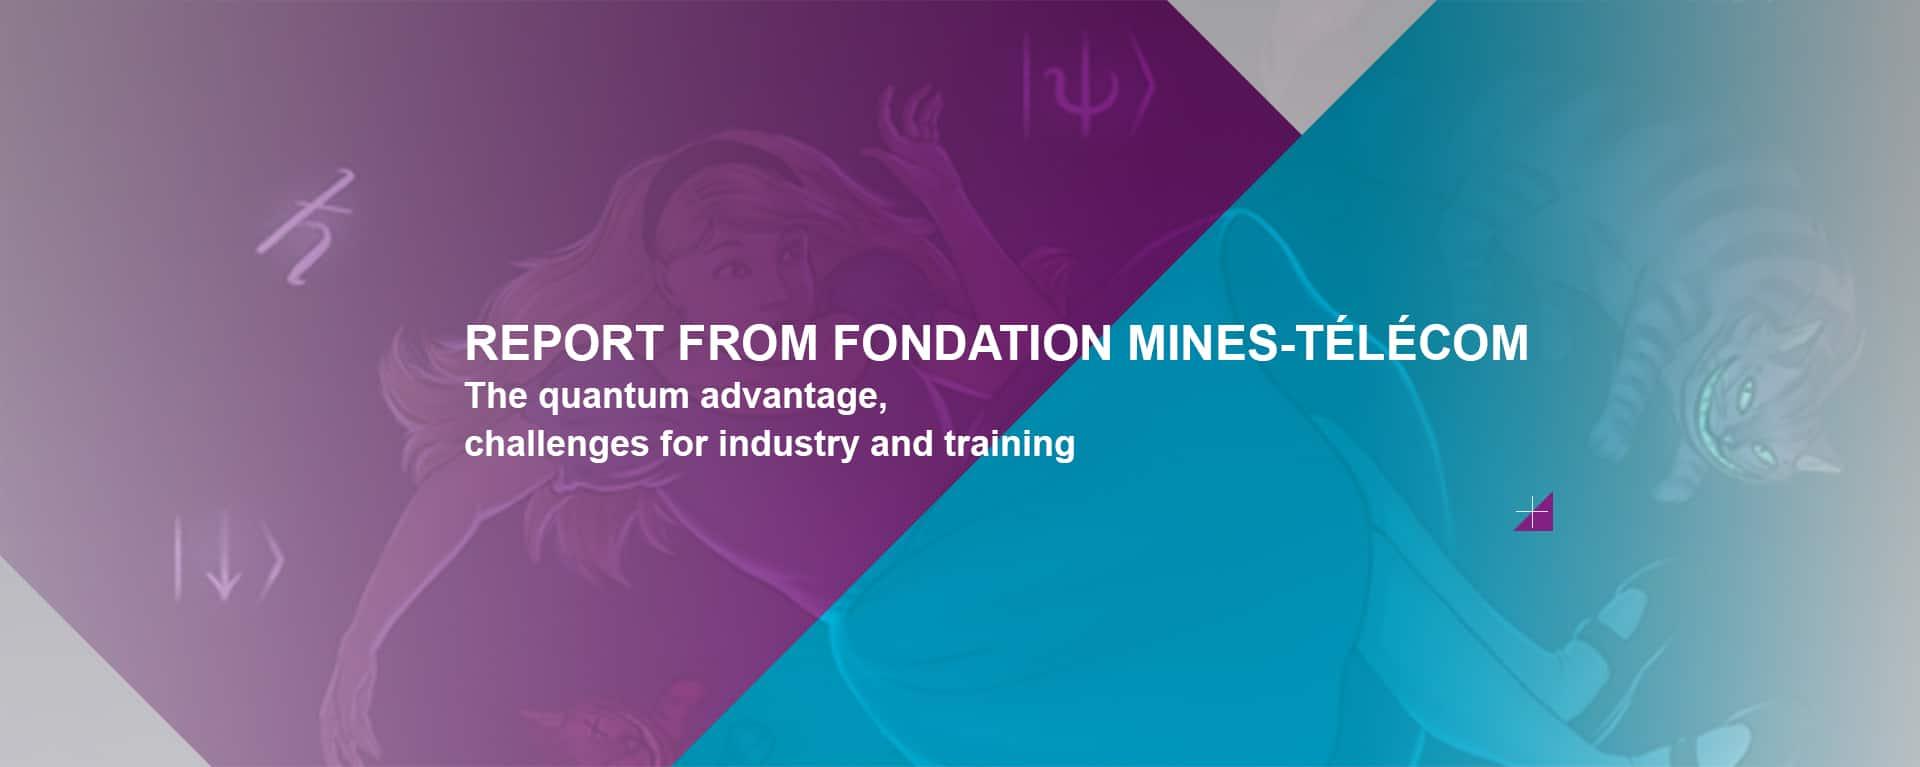 Quantum Advantage _ Report from Fondation Mines-Télécom